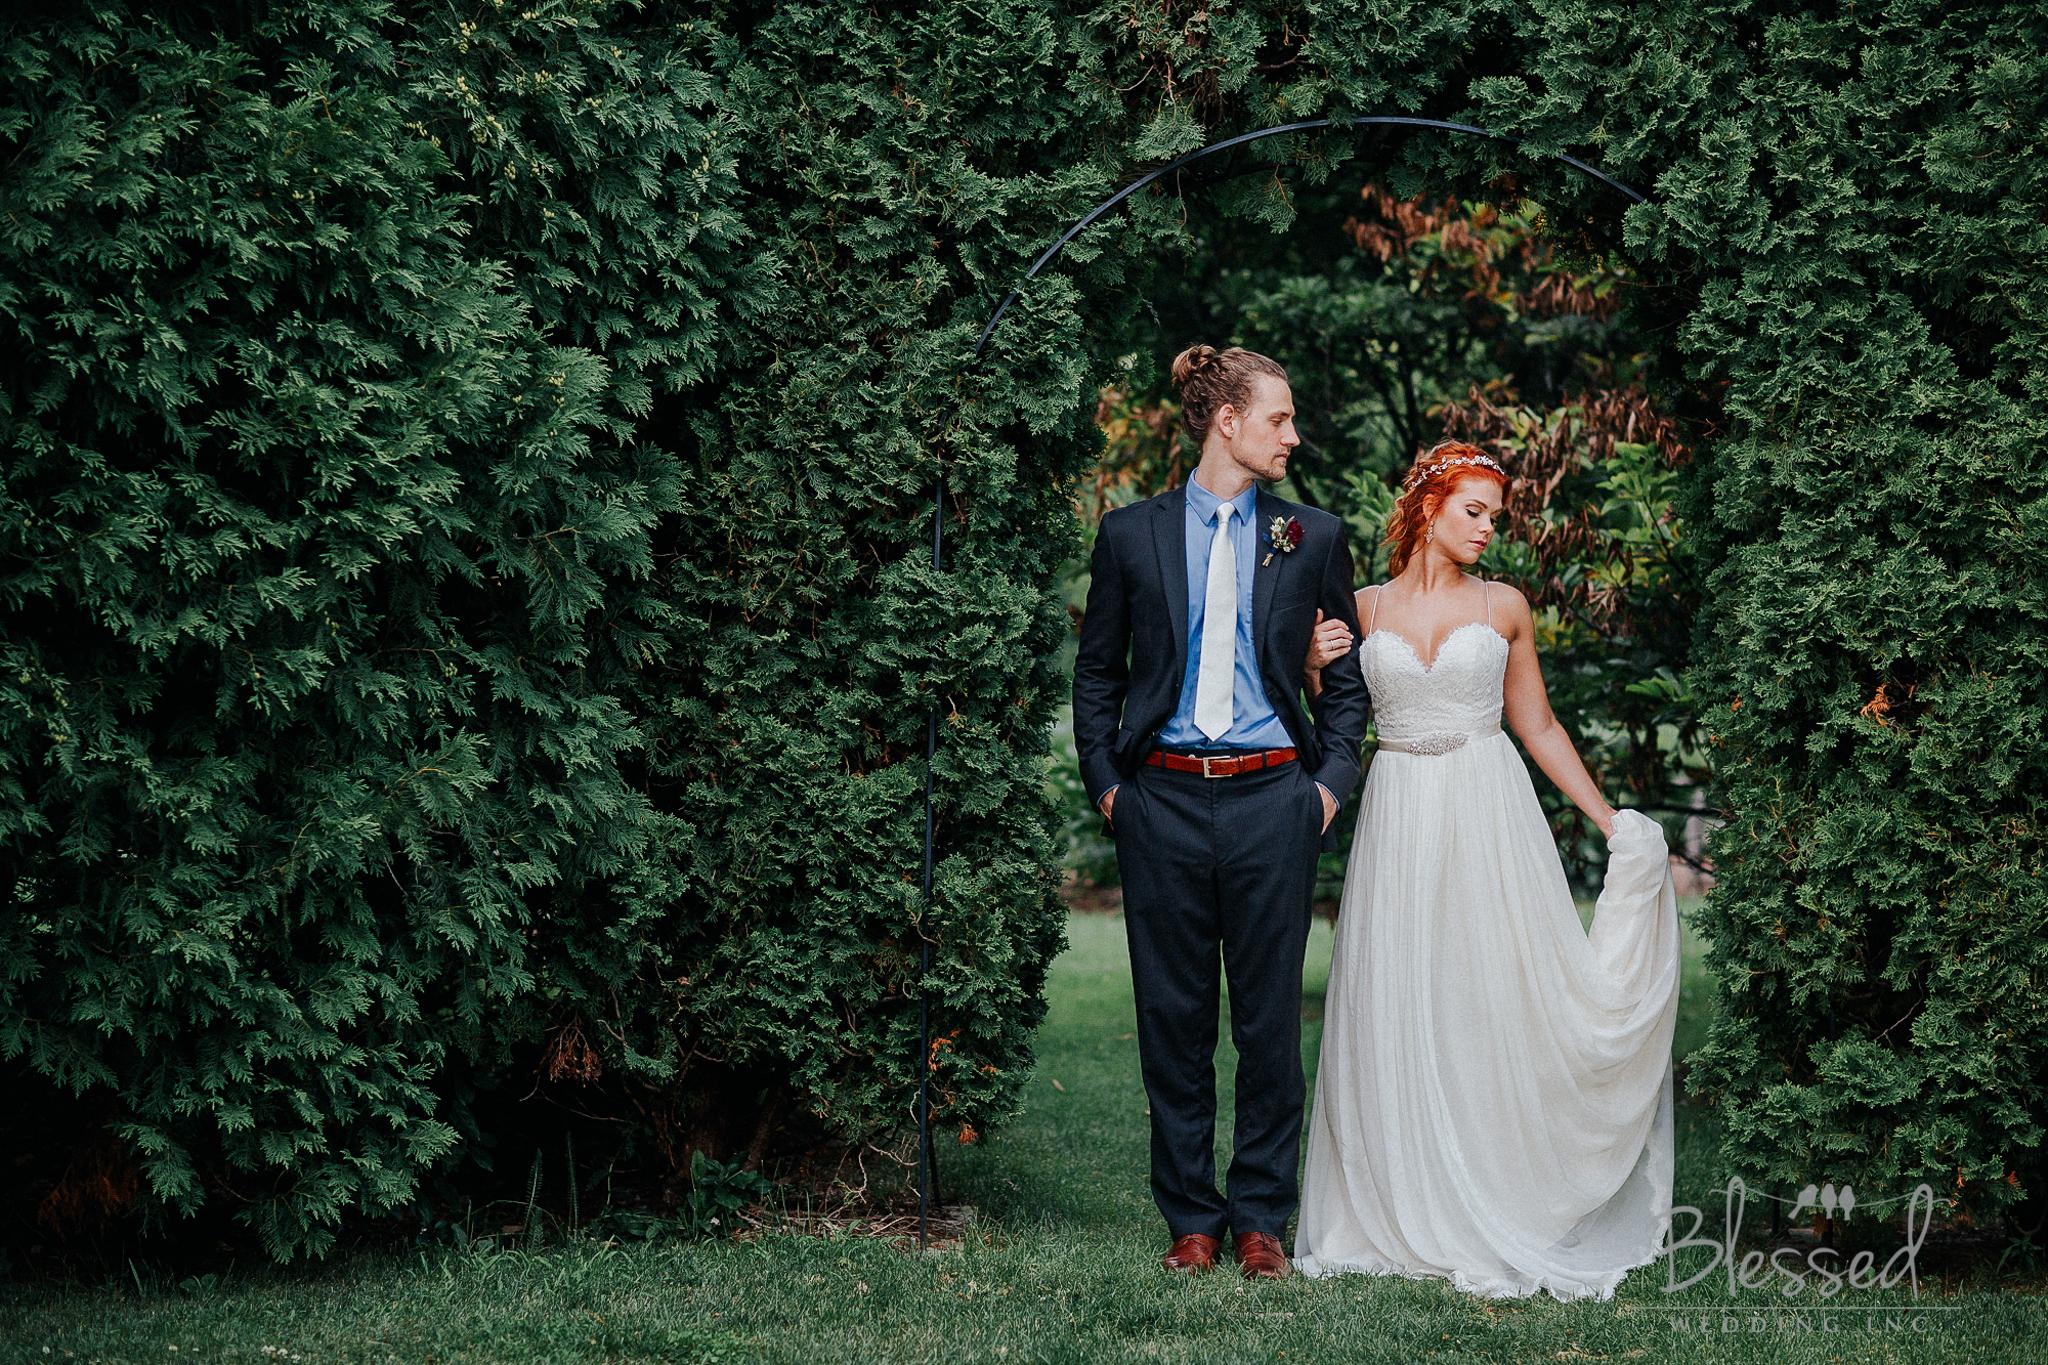 Destination Wedding Photography Minnesota By Blessed Wedding Photographers-48.jpg